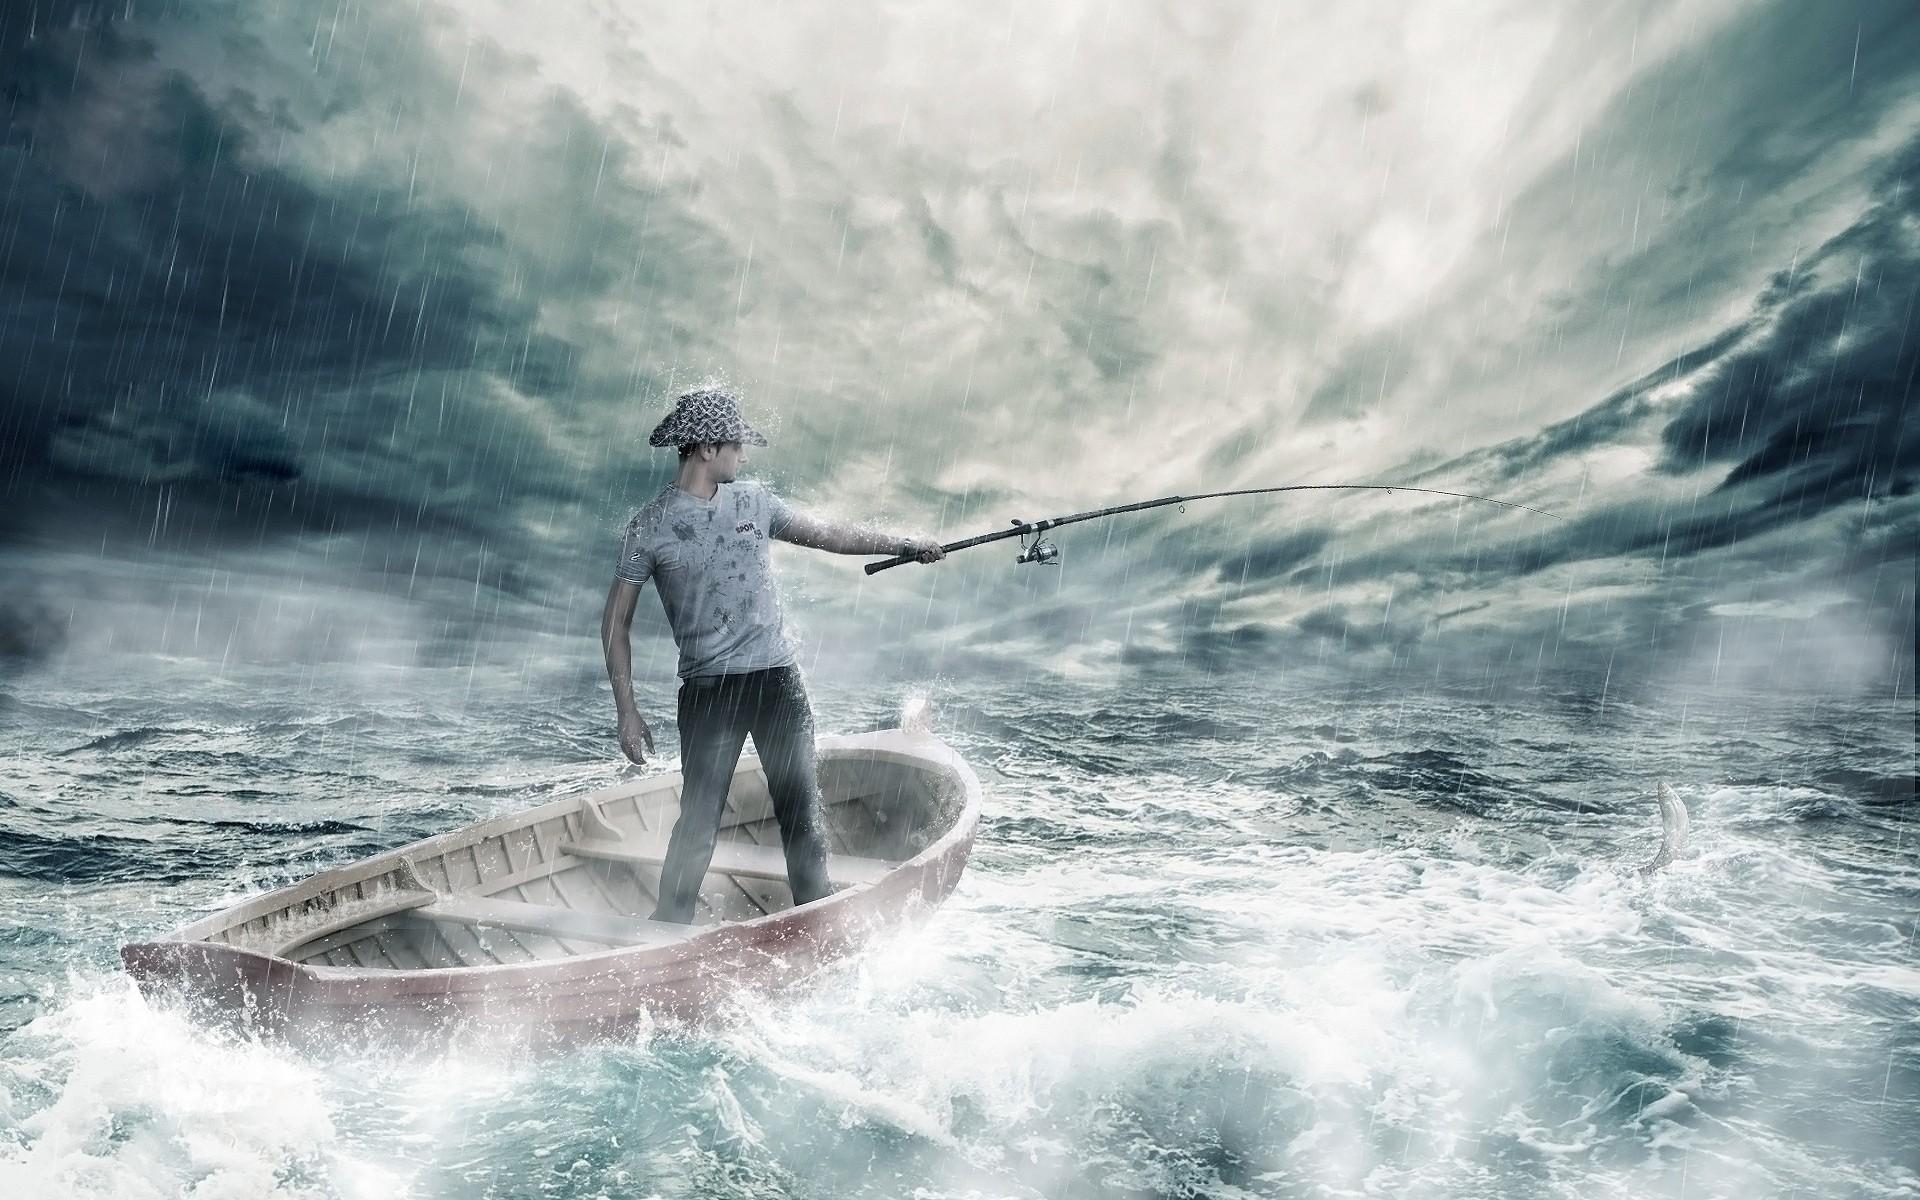 Stormy seas HD Wallpaper – New HD Wallpapers